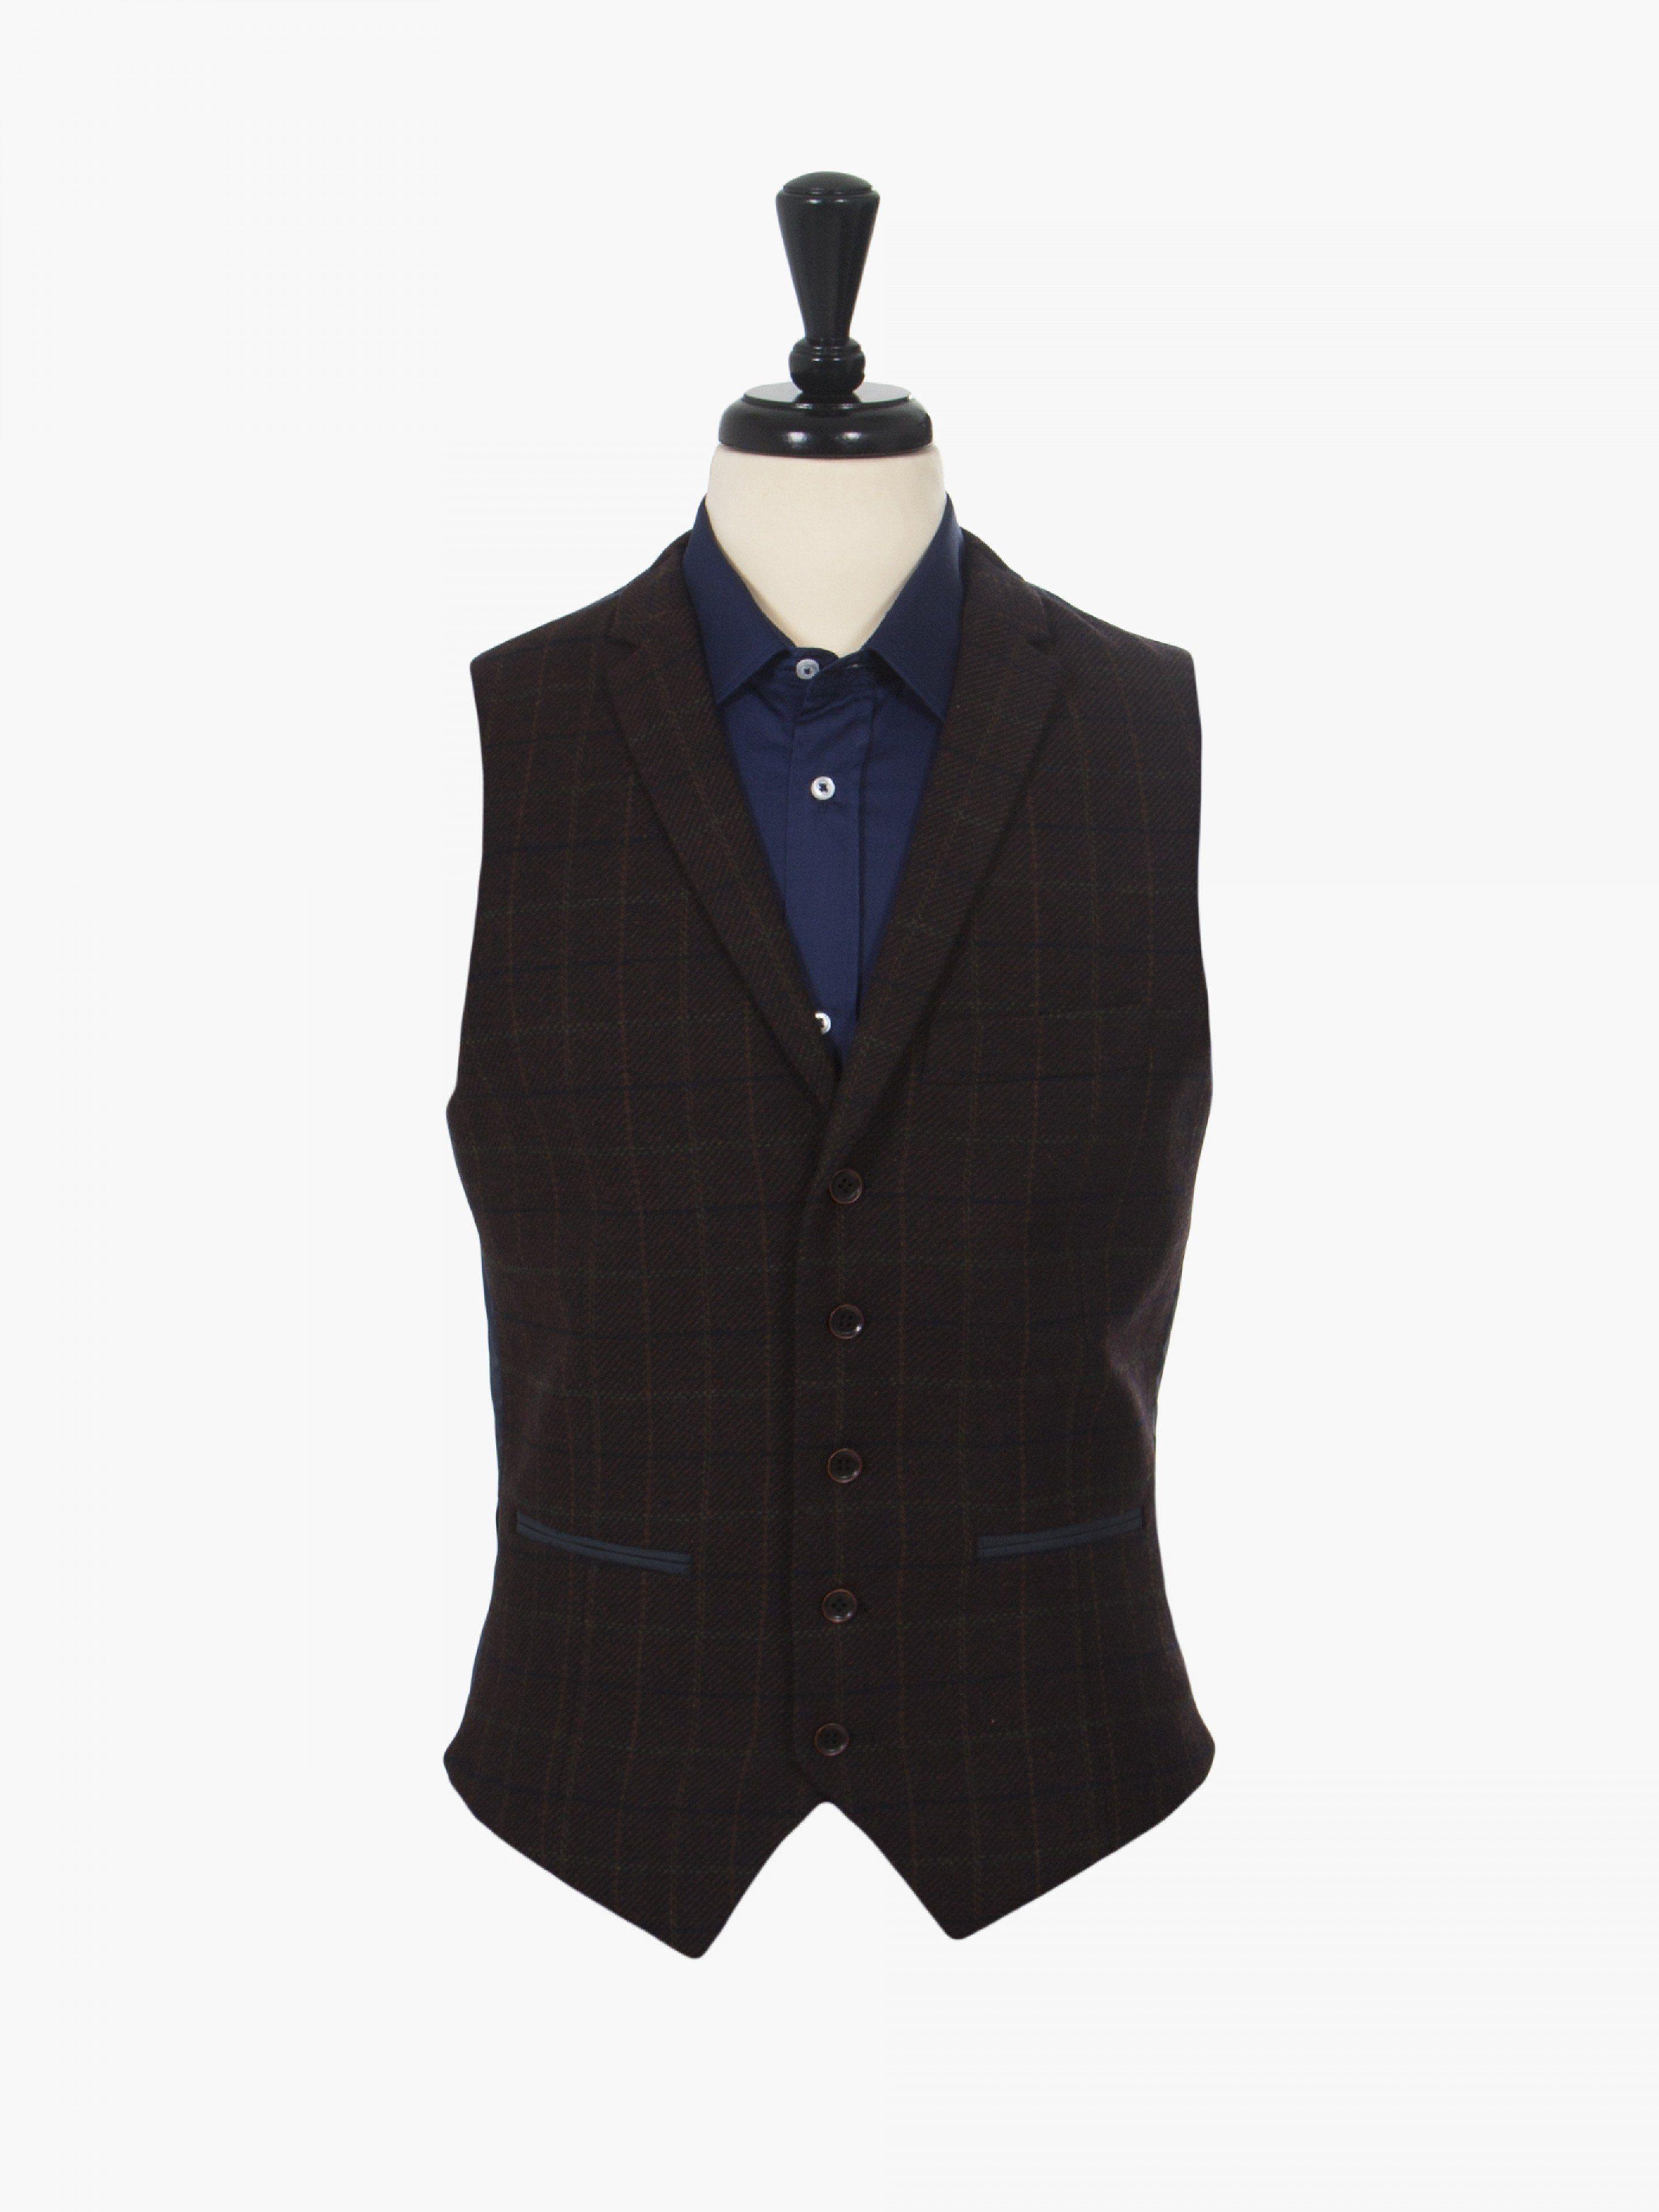 Harry Brown Burgundy Check Tweed Tailored Waistcoat